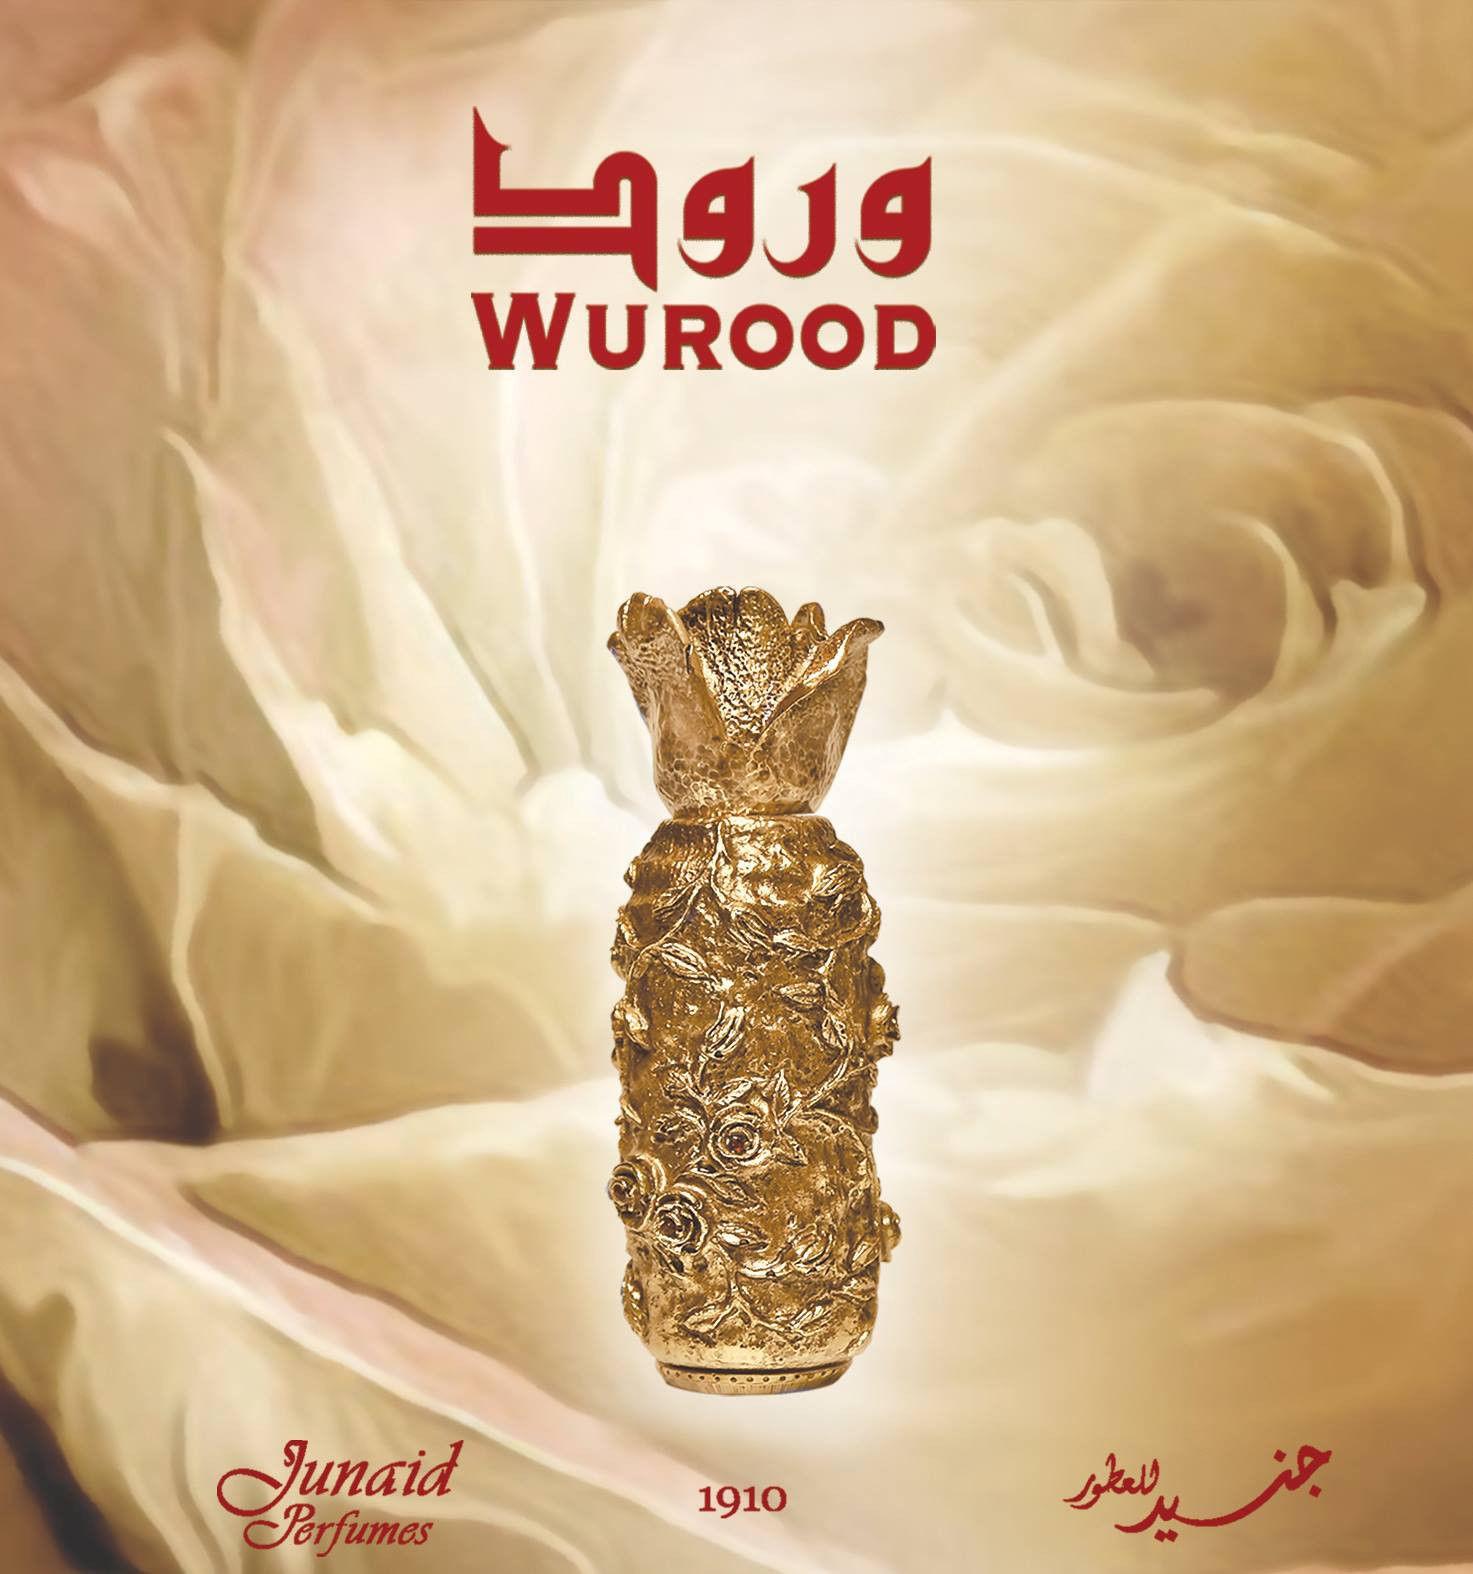 Пробник для Wurood Вуруд  1 мл спрей от Саид Джунаид Алам Syed Junaid Alam